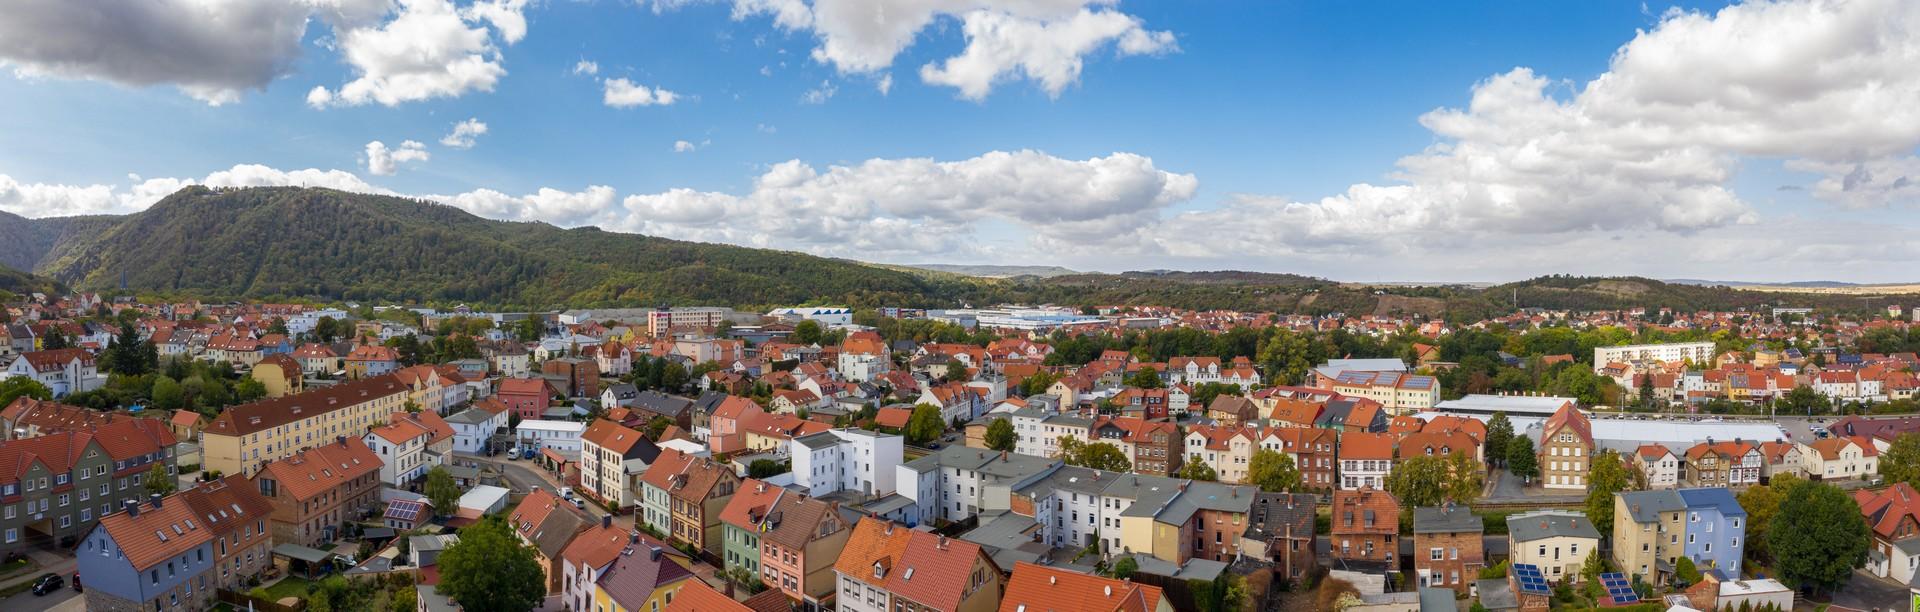 Architektur Fotograf Immobilienfotograf Bad Sooden-Allendorf Werbefotograf